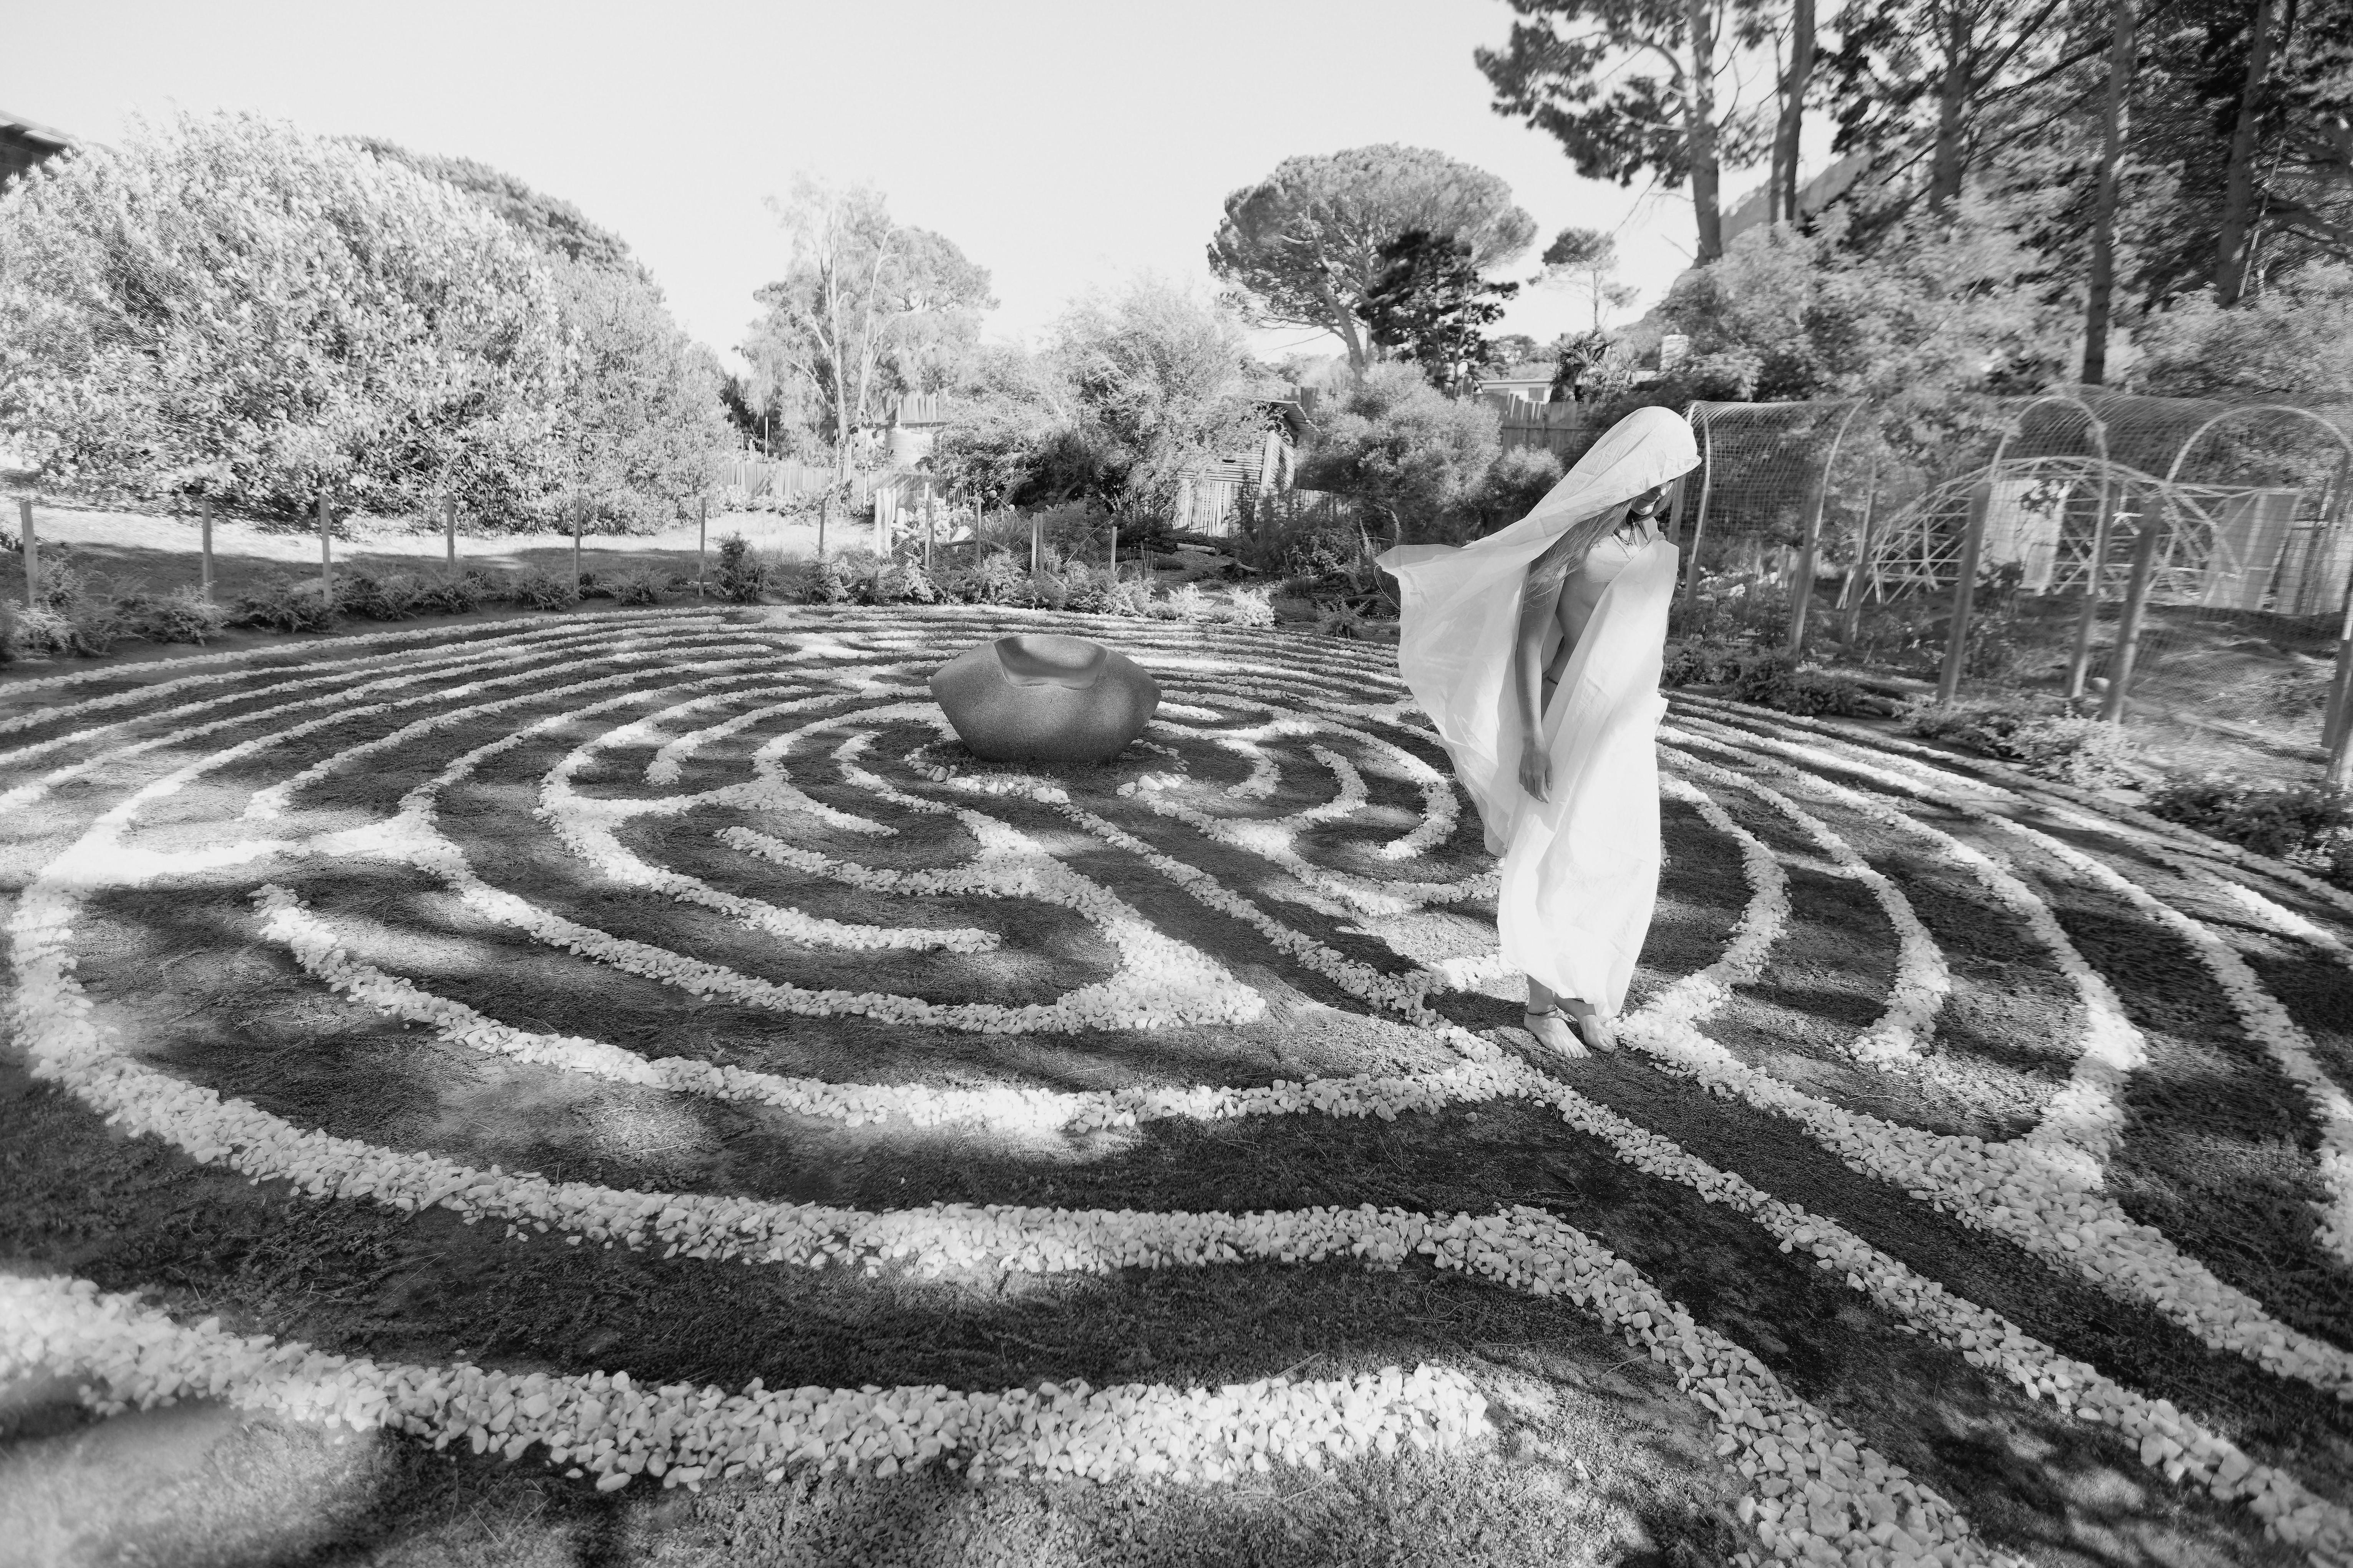 Labyrinth and Wheel balances